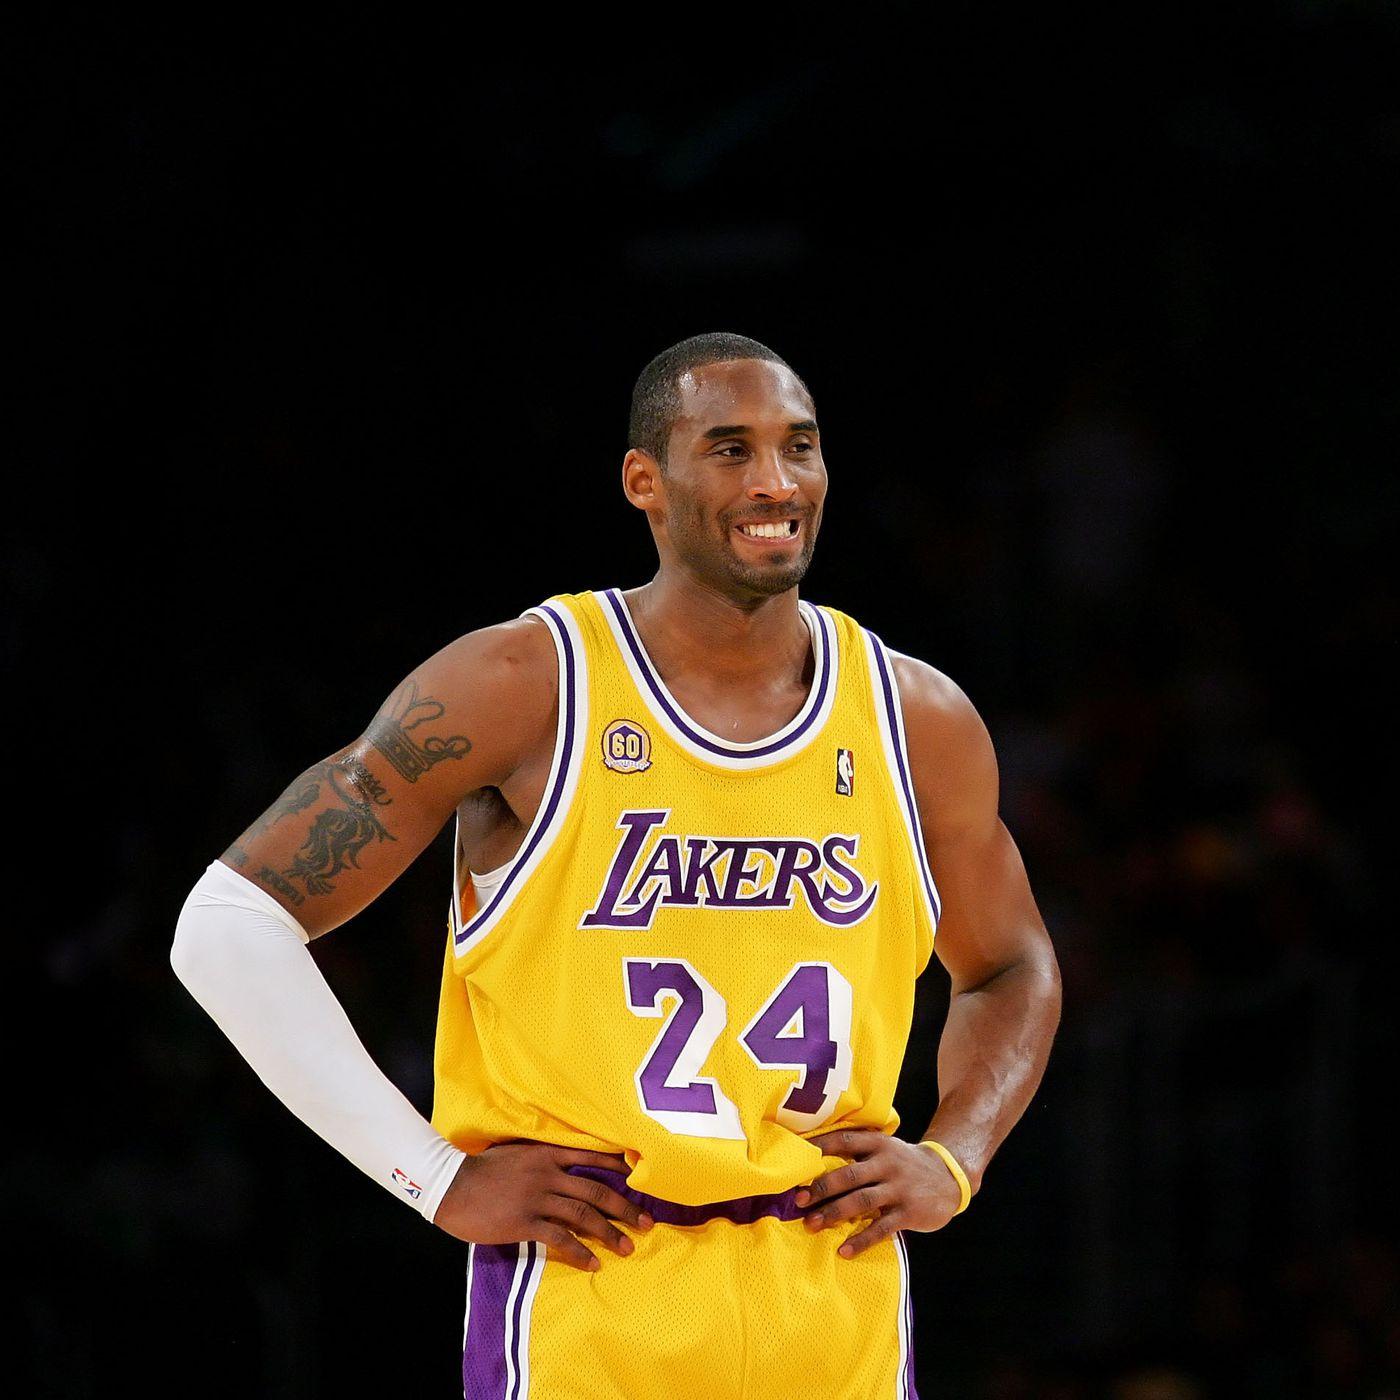 74da1ba81d8 Kobe Bryant s 4-game 50-point streak was a decade ago this week -  SBNation.com